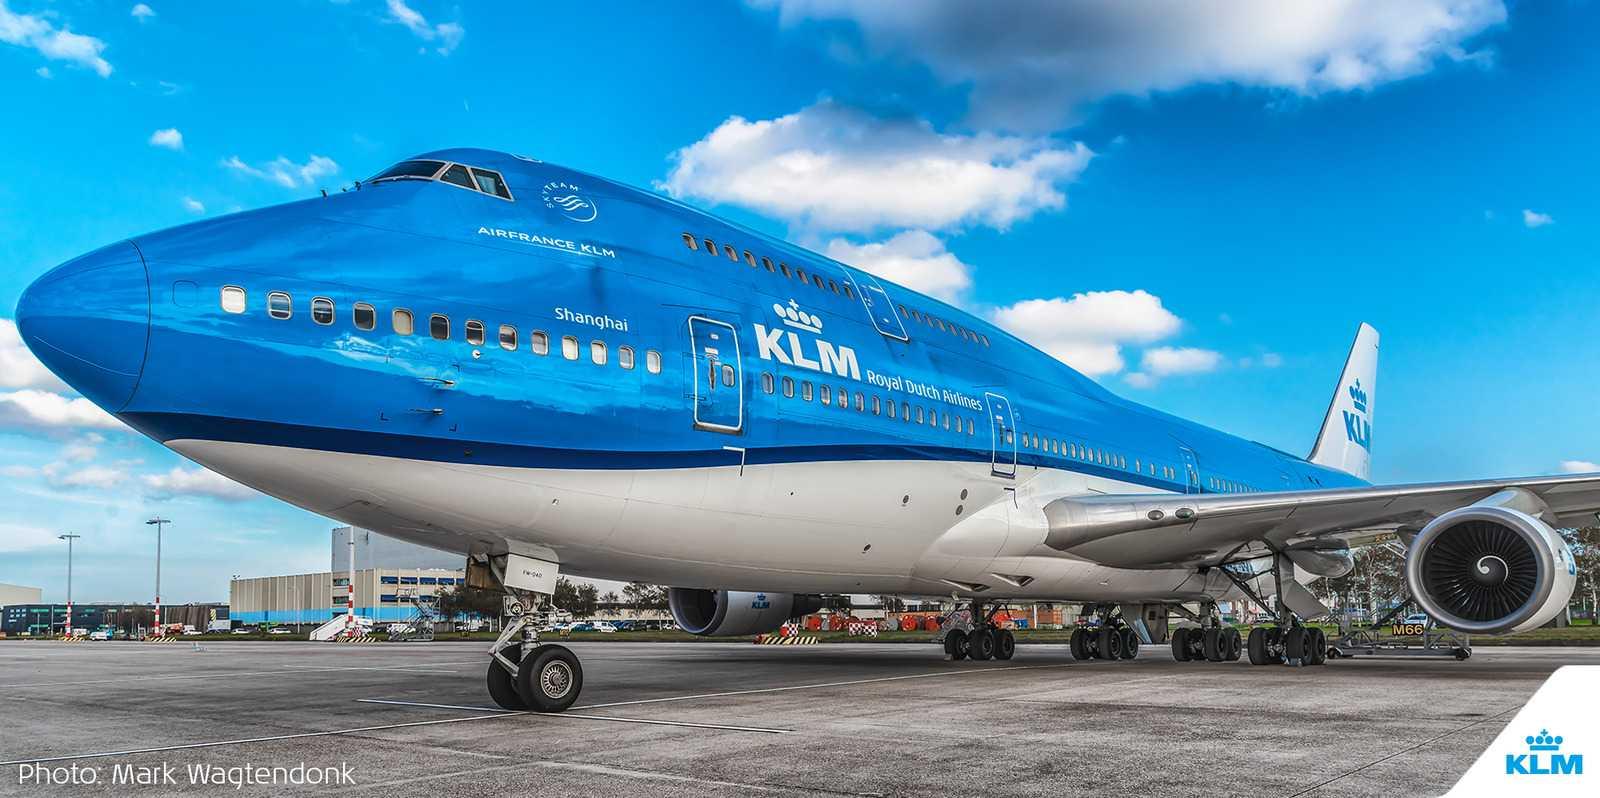 Boeing 747 Combi. Фото: Mark Wagtendonk/@KLM/Twitter.